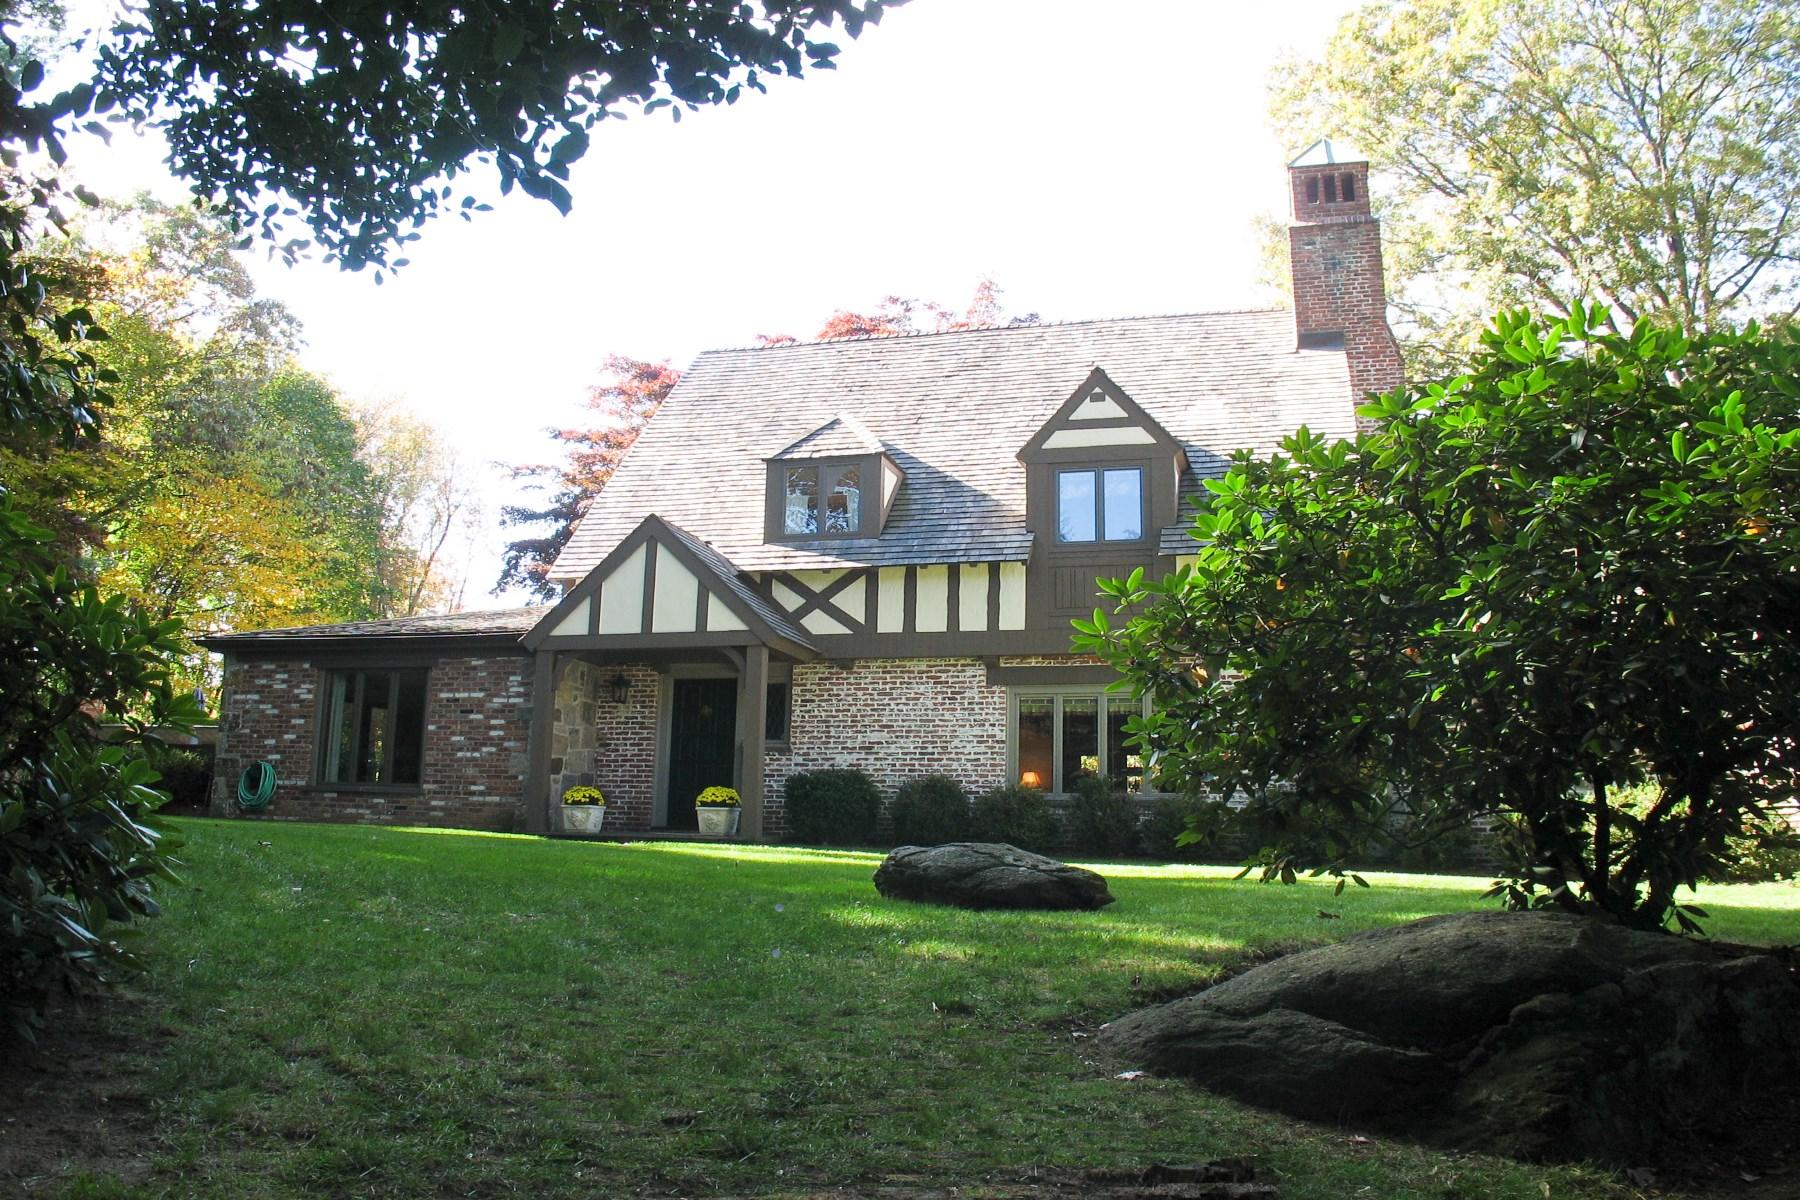 独户住宅 为 销售 在 28 Upland Drive Central Greenwich, Greenwich, 康涅狄格州 06831 美国